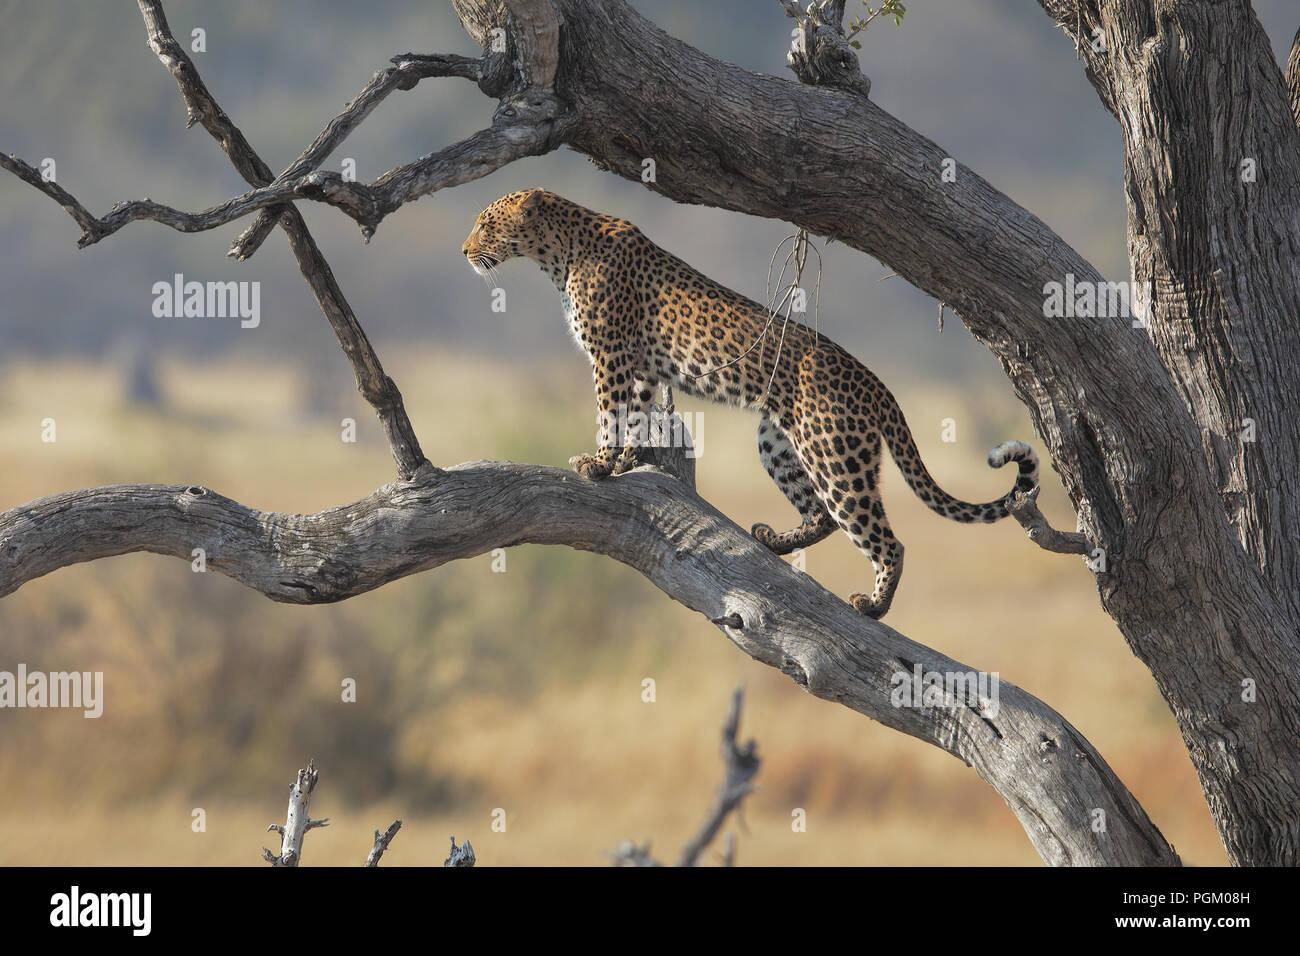 Leopard en Moremi Imagen De Stock